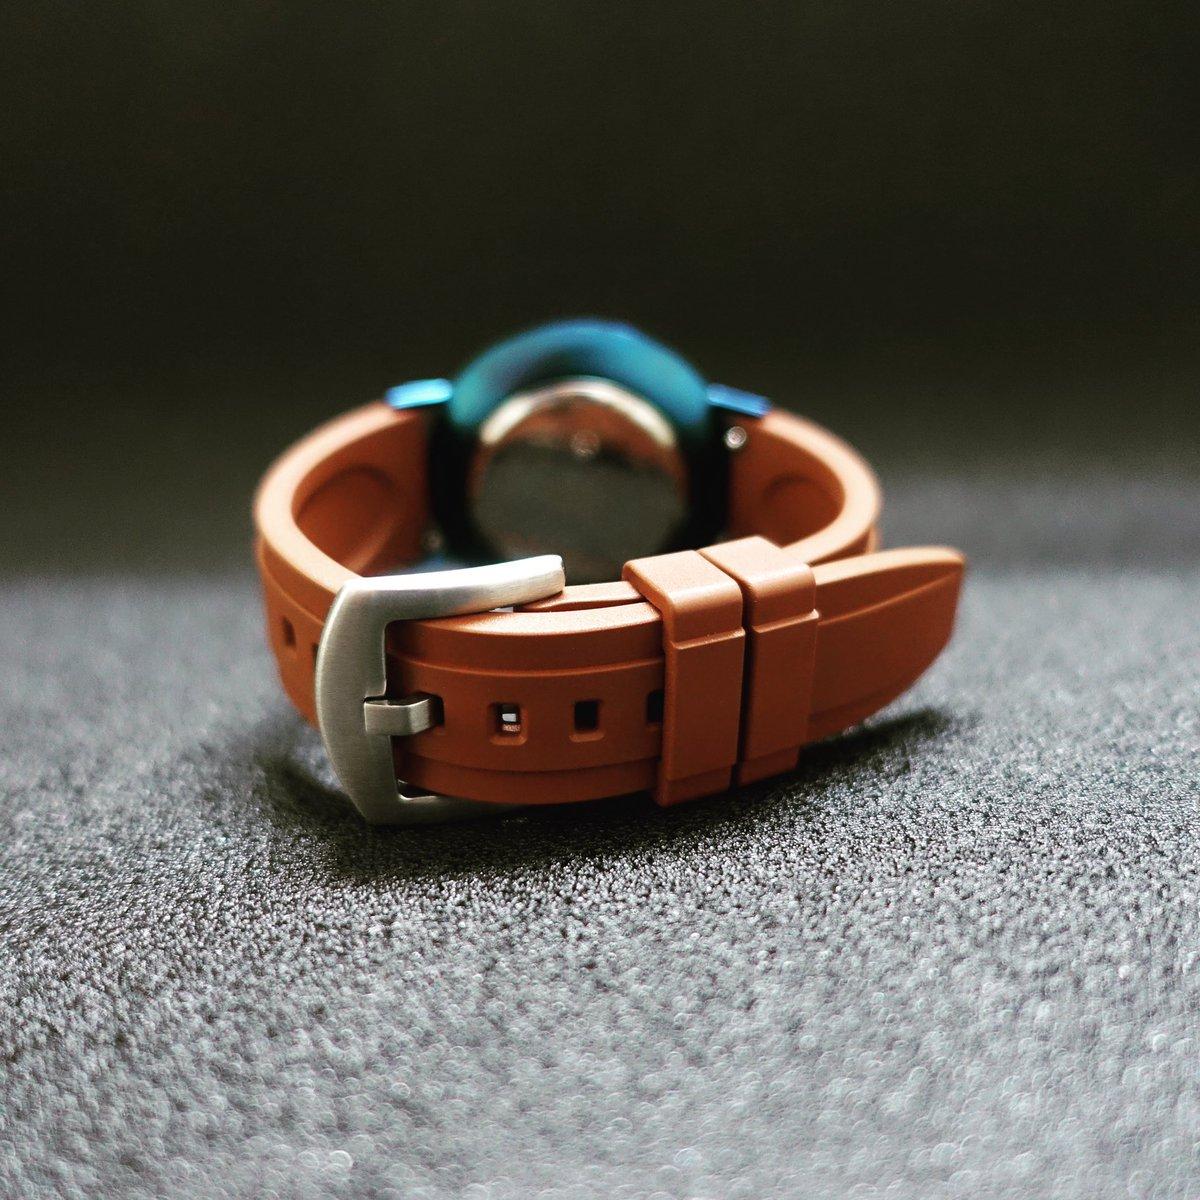 FKM rubber watch band. #watchband 18-24mm #natostrap https://t.co/FZSXUjaVSz